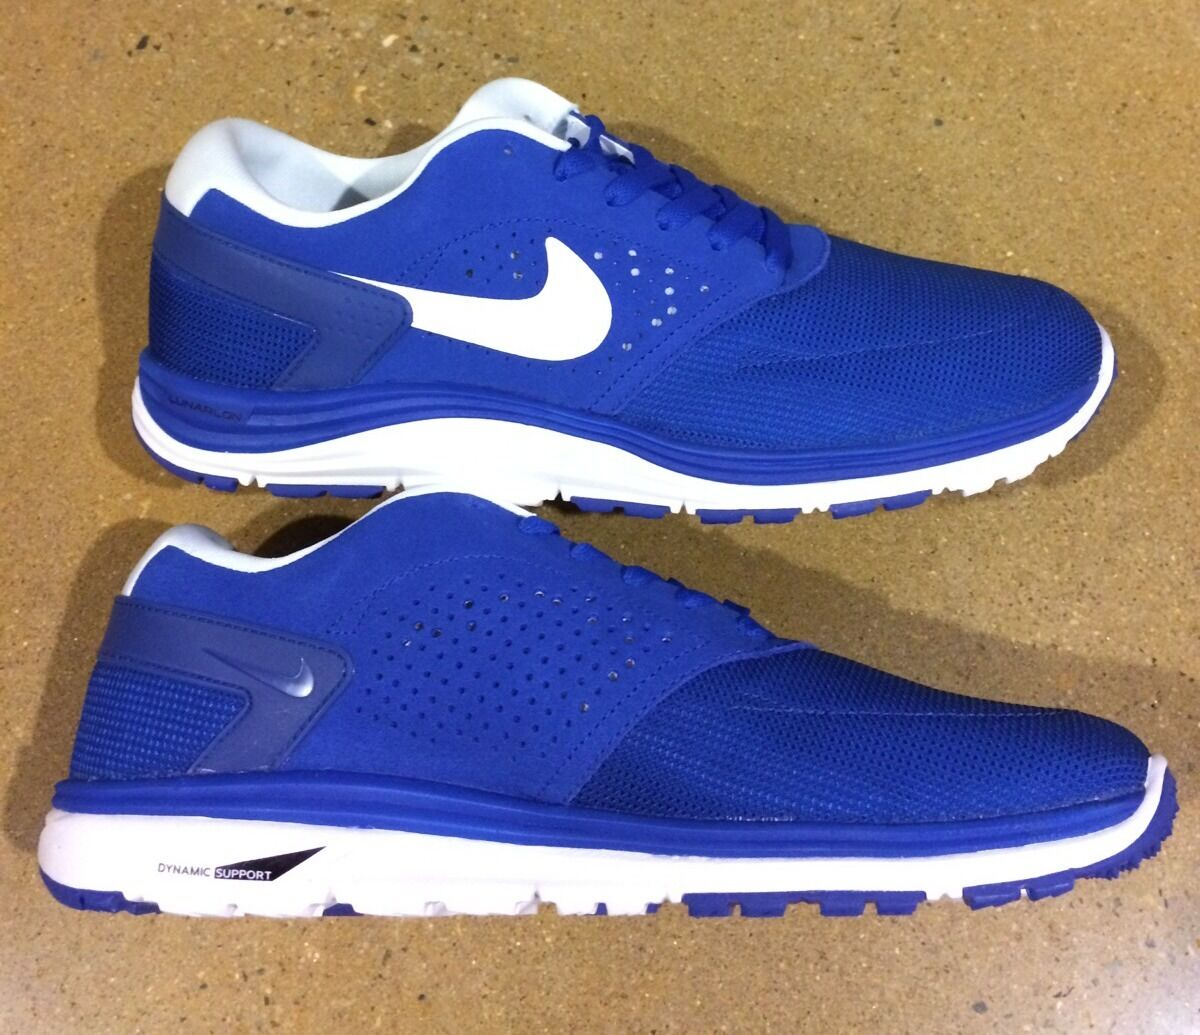 Nike sb lunar rod sz 13 gioco royal white paul rodriguez 6 6 msrp pattinare correre